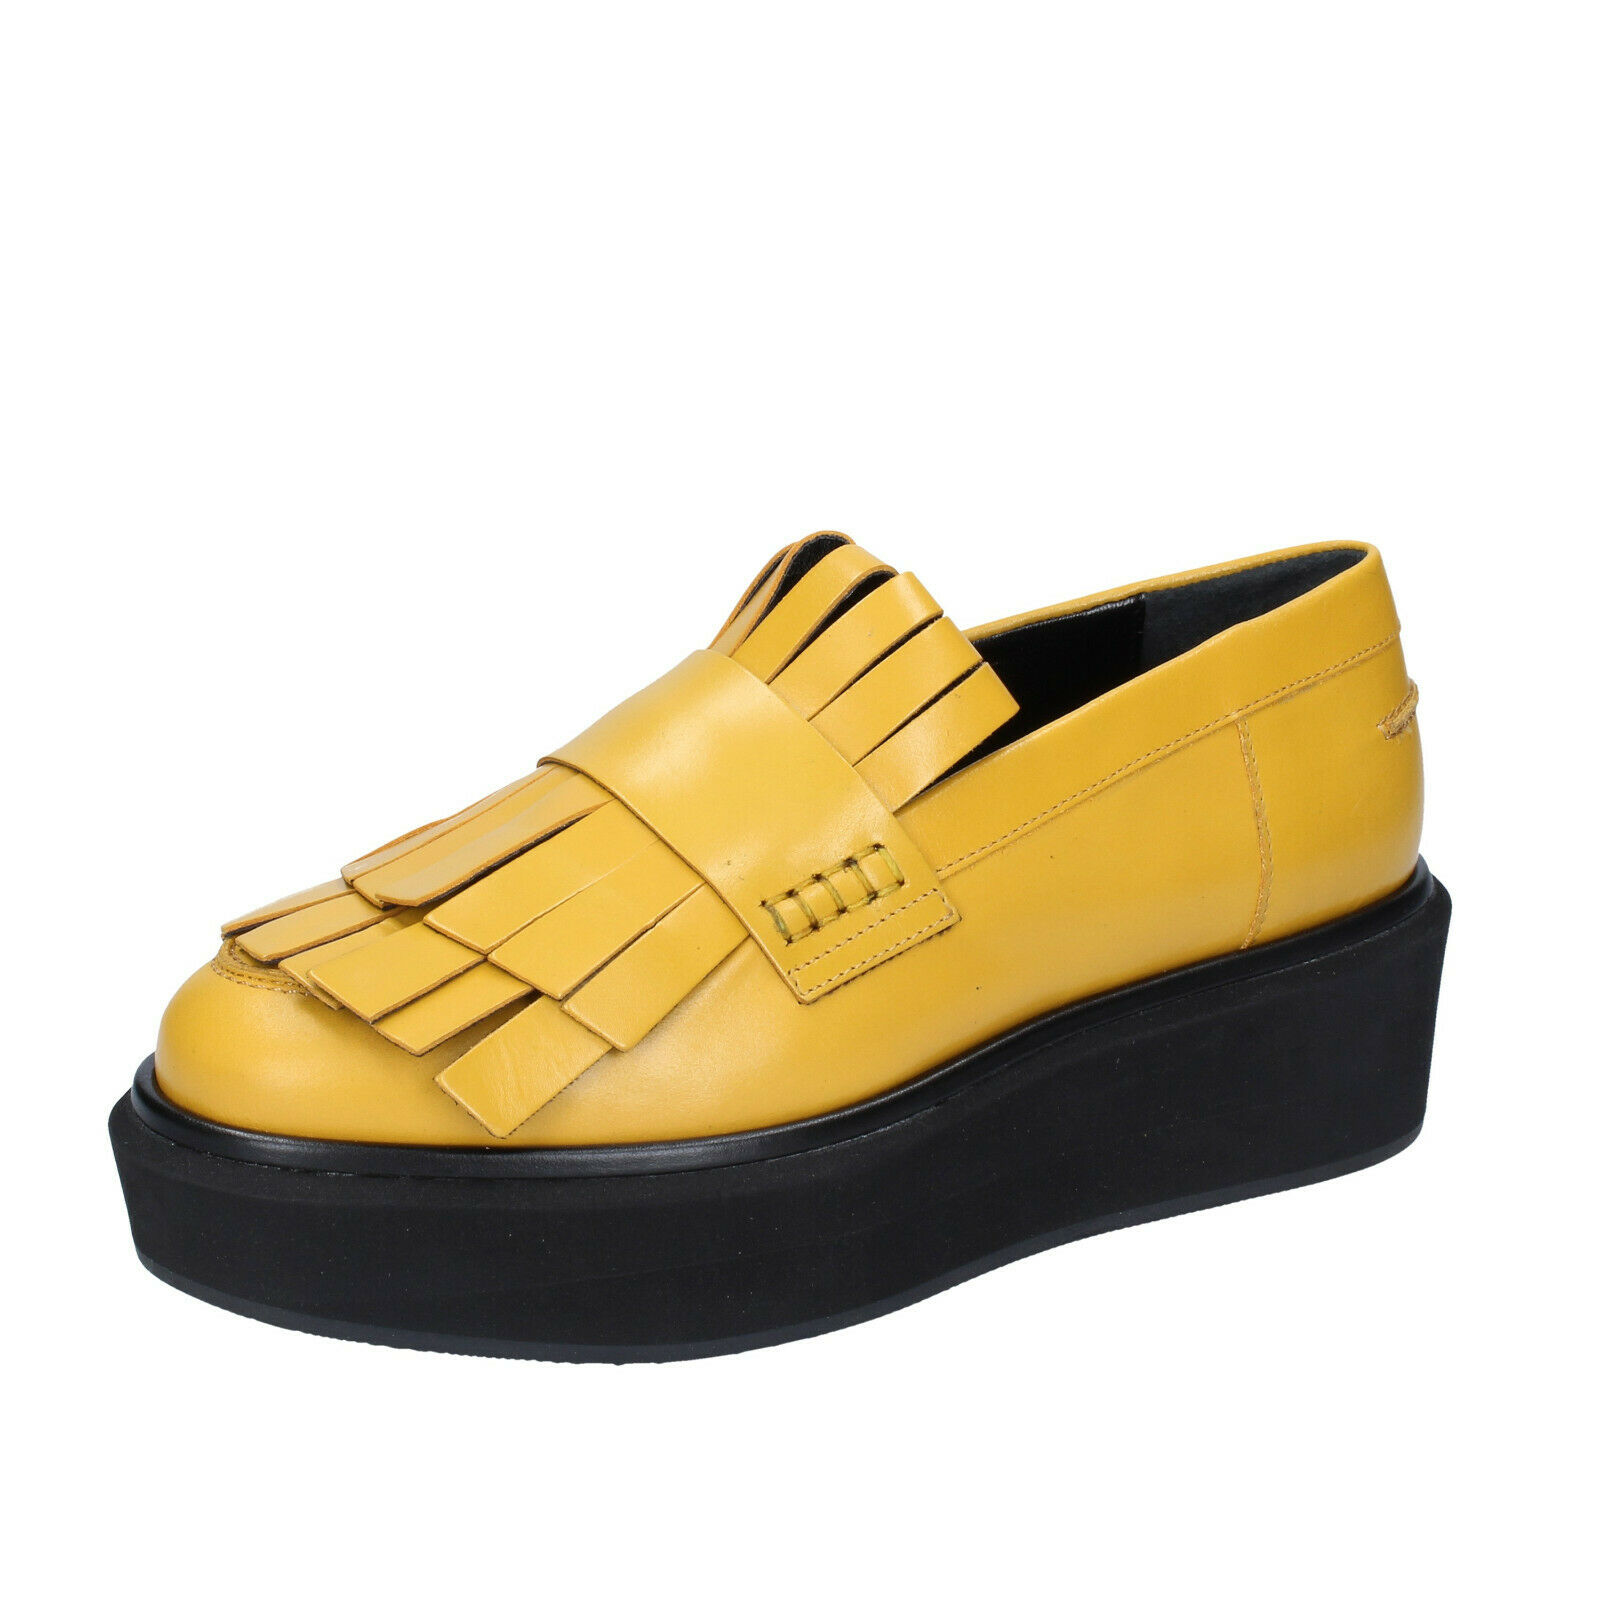 Ladies scarpe Paloma Barcelo ' 40  EU Moccasines giallo Leather BS643 -40  varie dimensioni